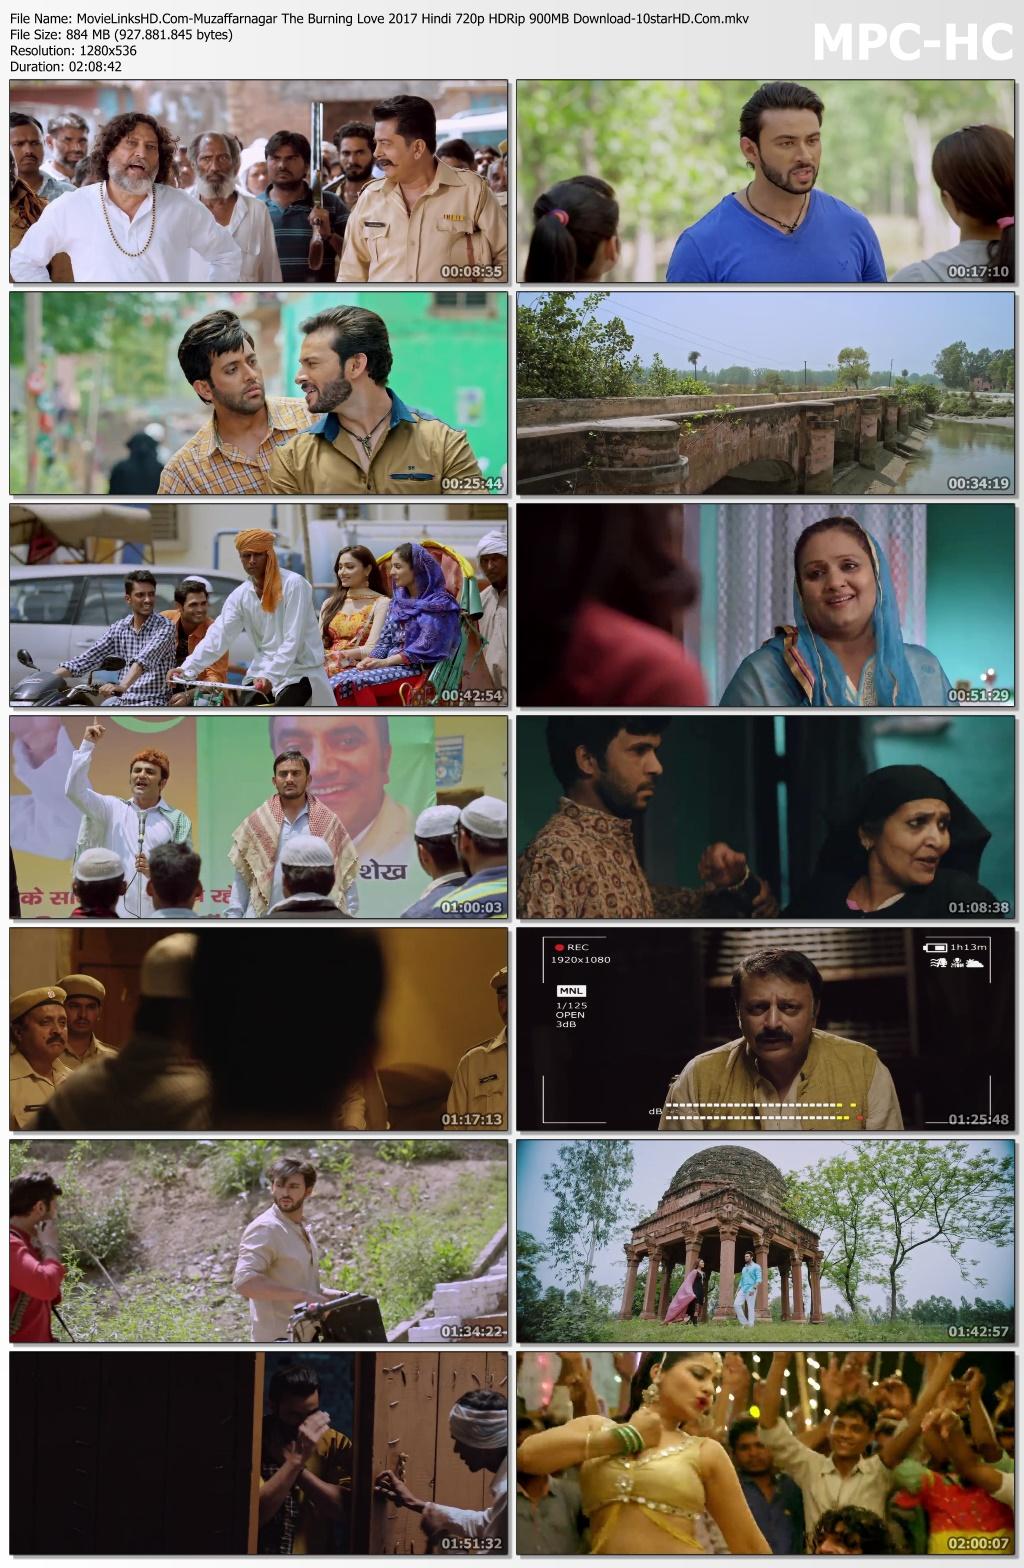 Movie-Links-HD-Com-Muzaffarnagar-The-Burning-Love-2017-Hindi-720p-HDRip-900-MB-Download-10star-HD-Co